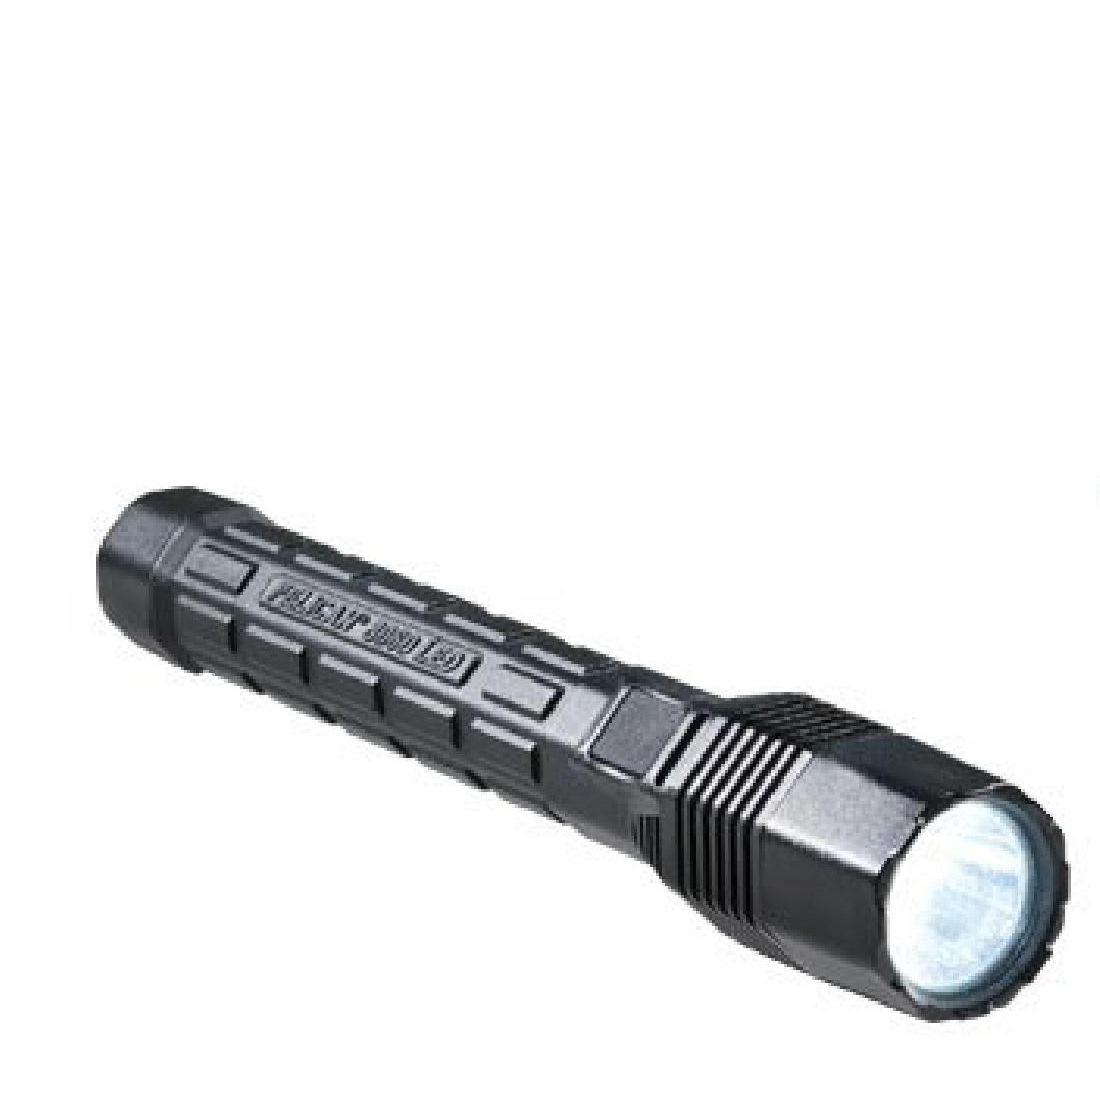 Flashlight Approvals รุ่น 8060(ไม่กันระเบิด) ยี่ห้อ Pelican